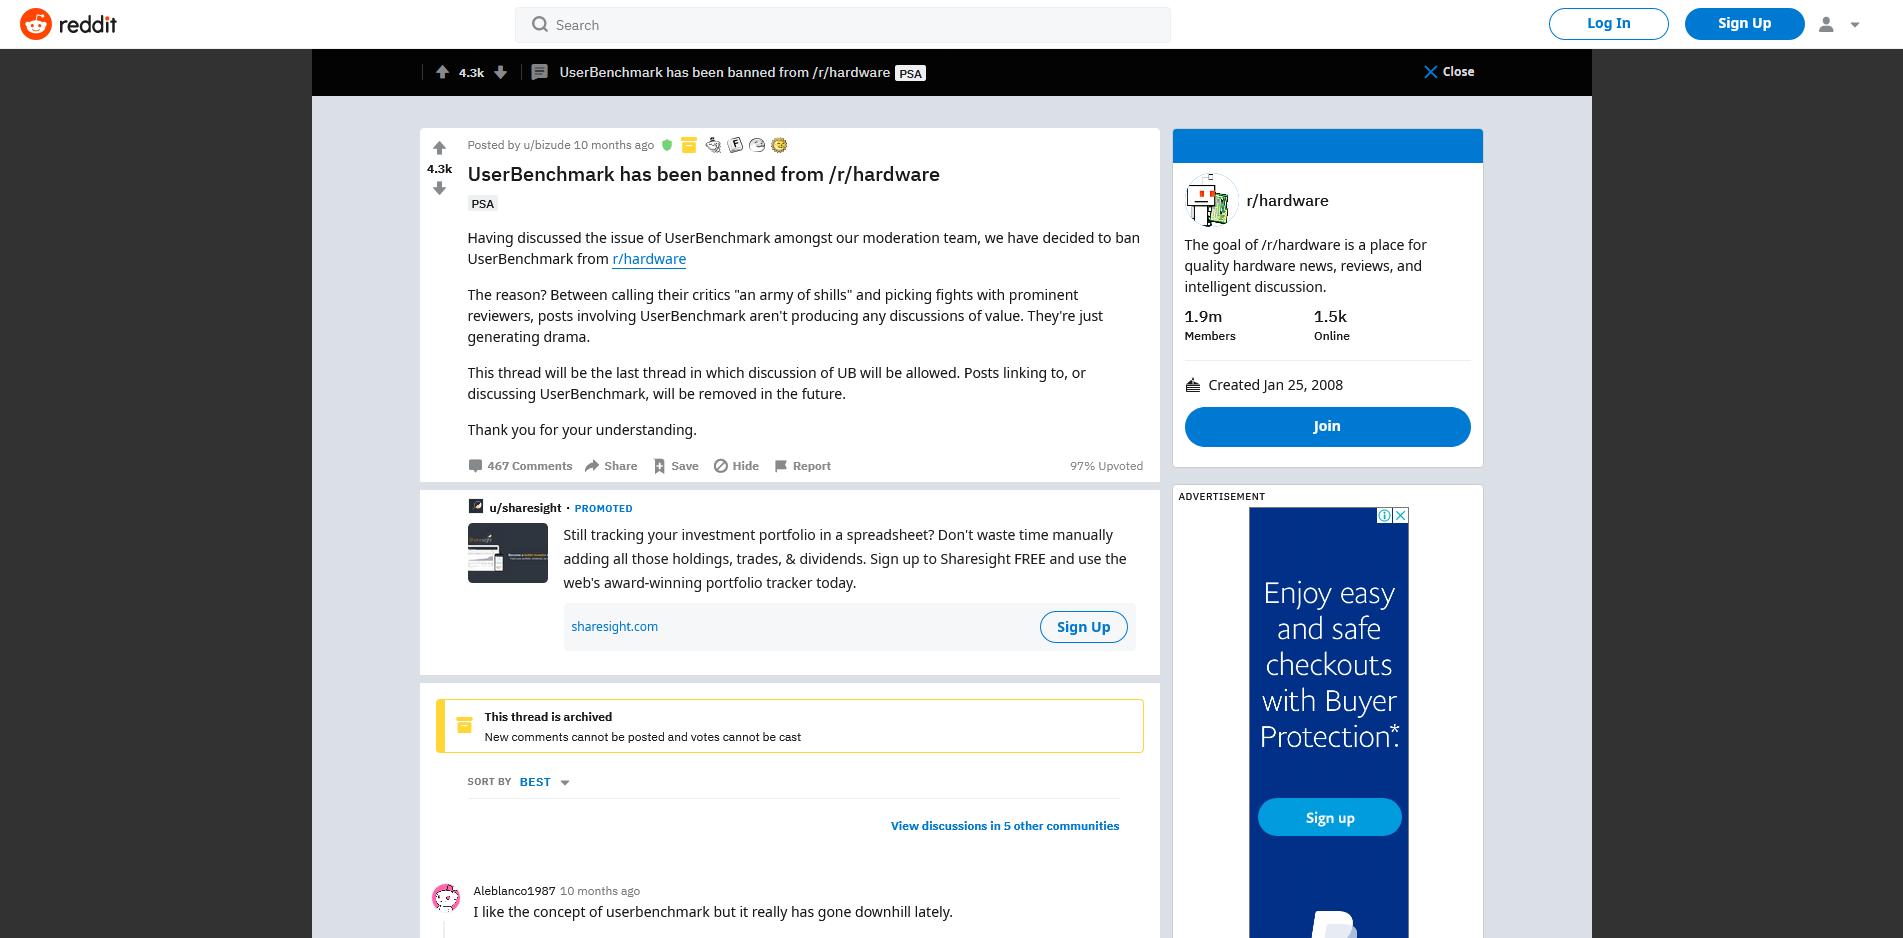 UserBenchmark subreddit ban